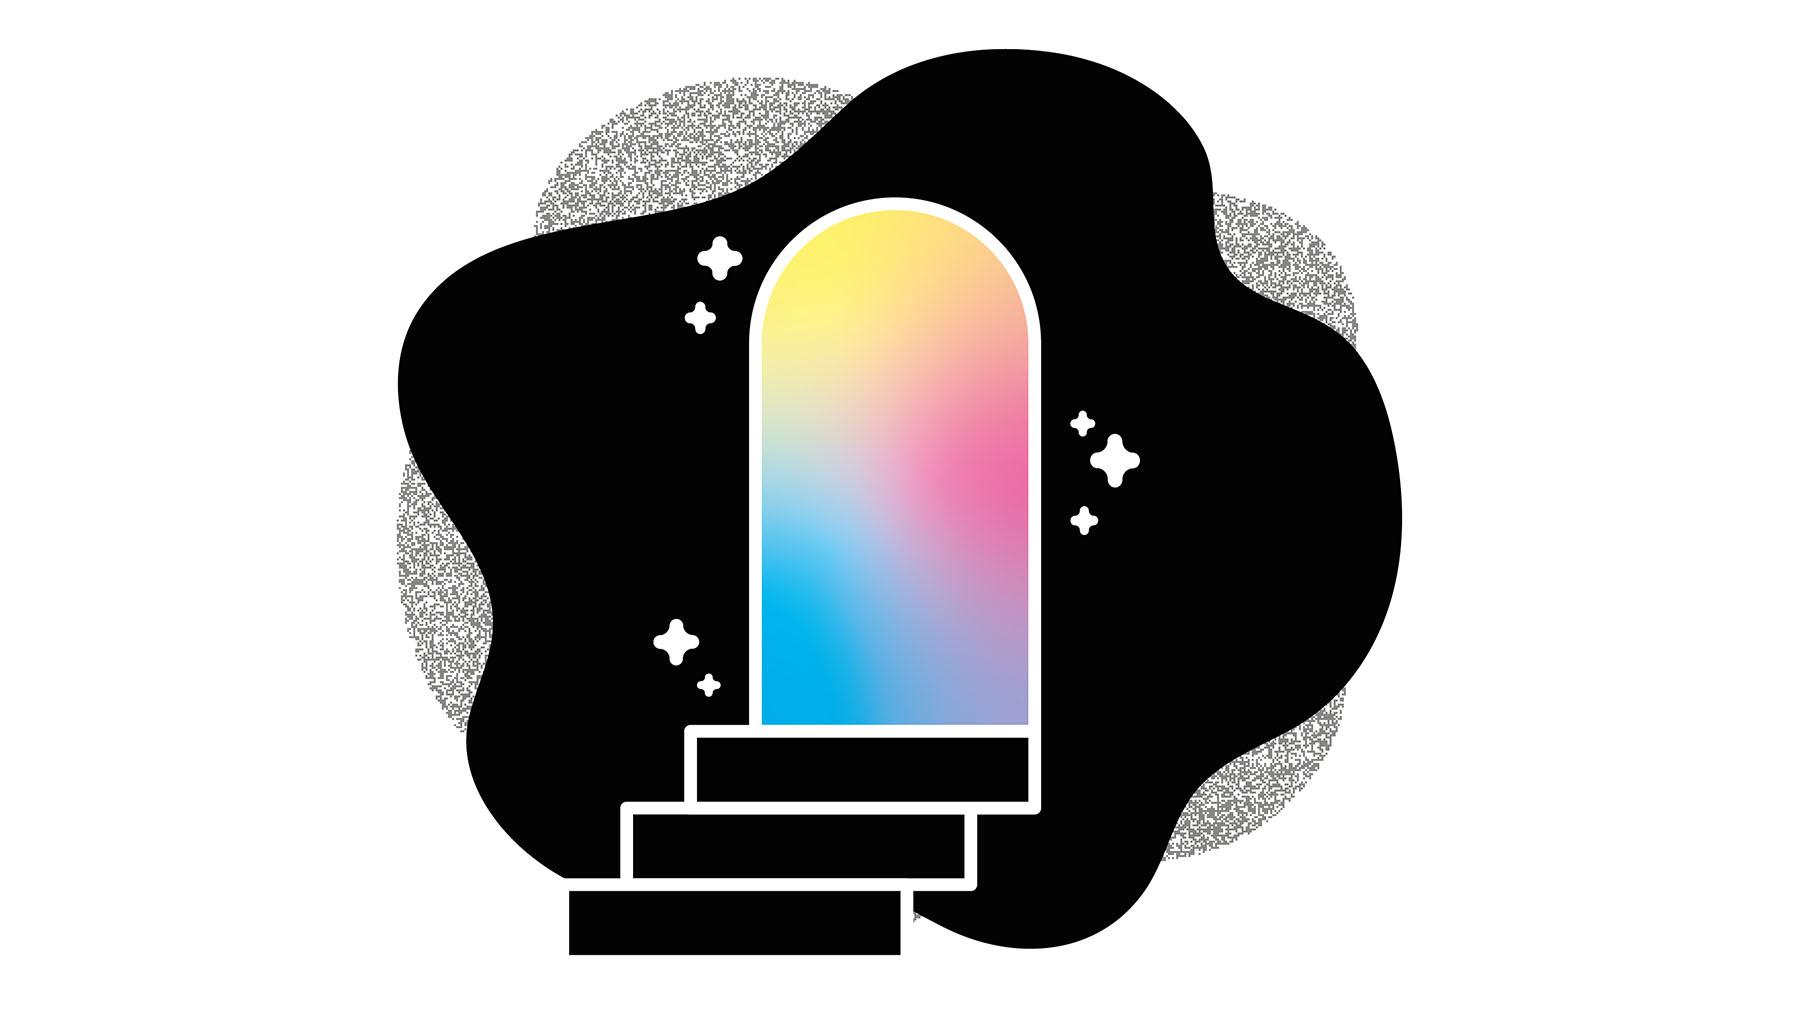 Illustrator CC 2019 review | Creative Bloq